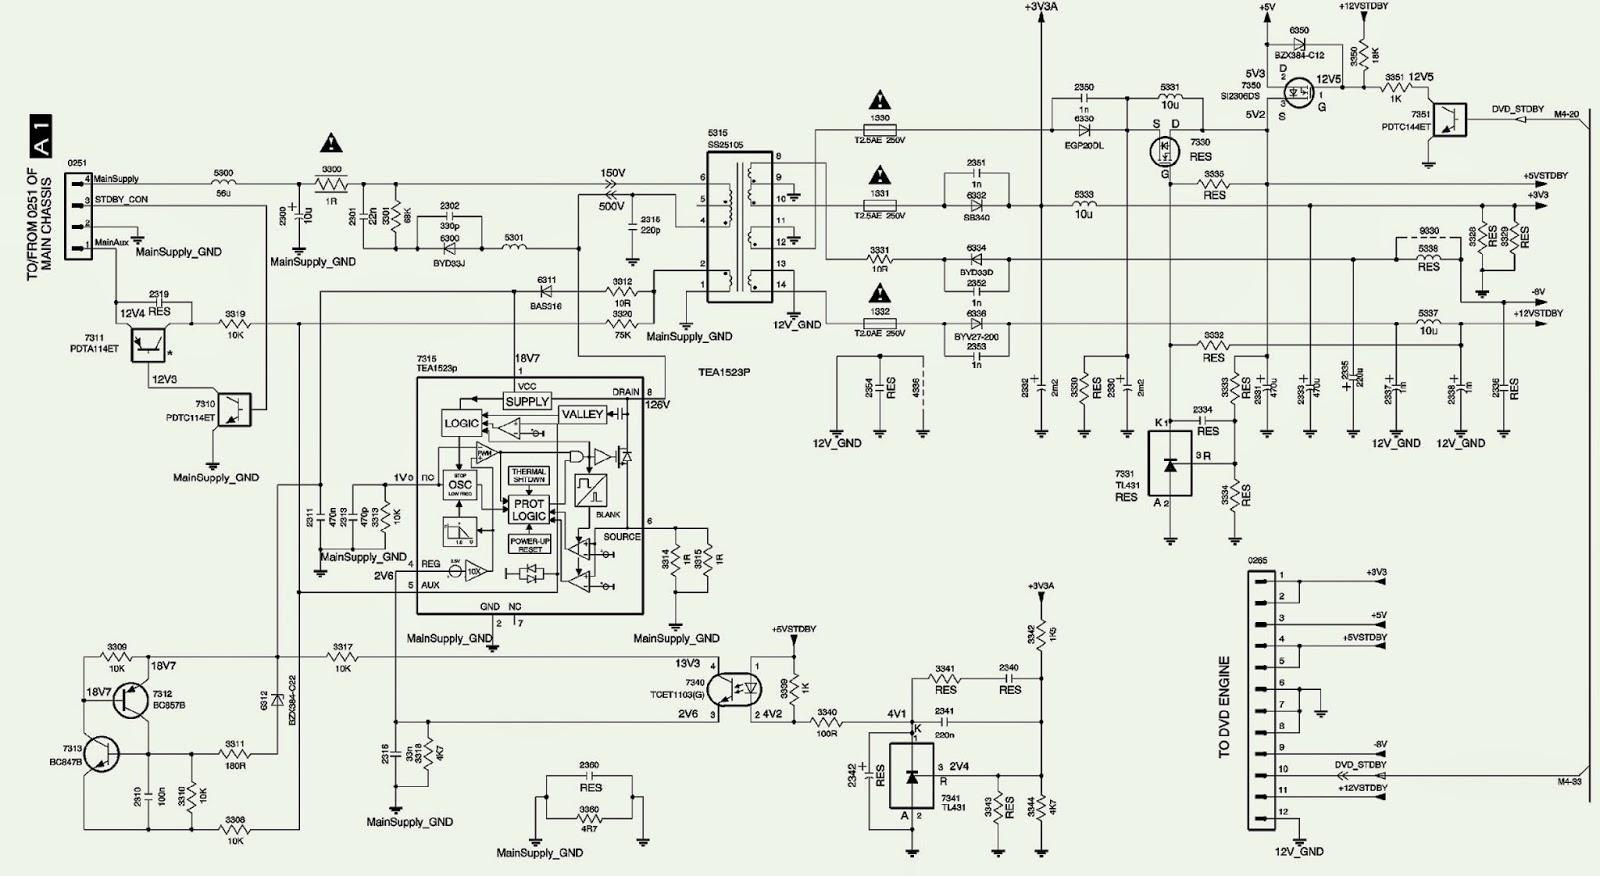 philips magnavox – 32st220p – 27pt543 – tv – power supply ... 65 pontiac wiring diagram magnavox wiring diagram